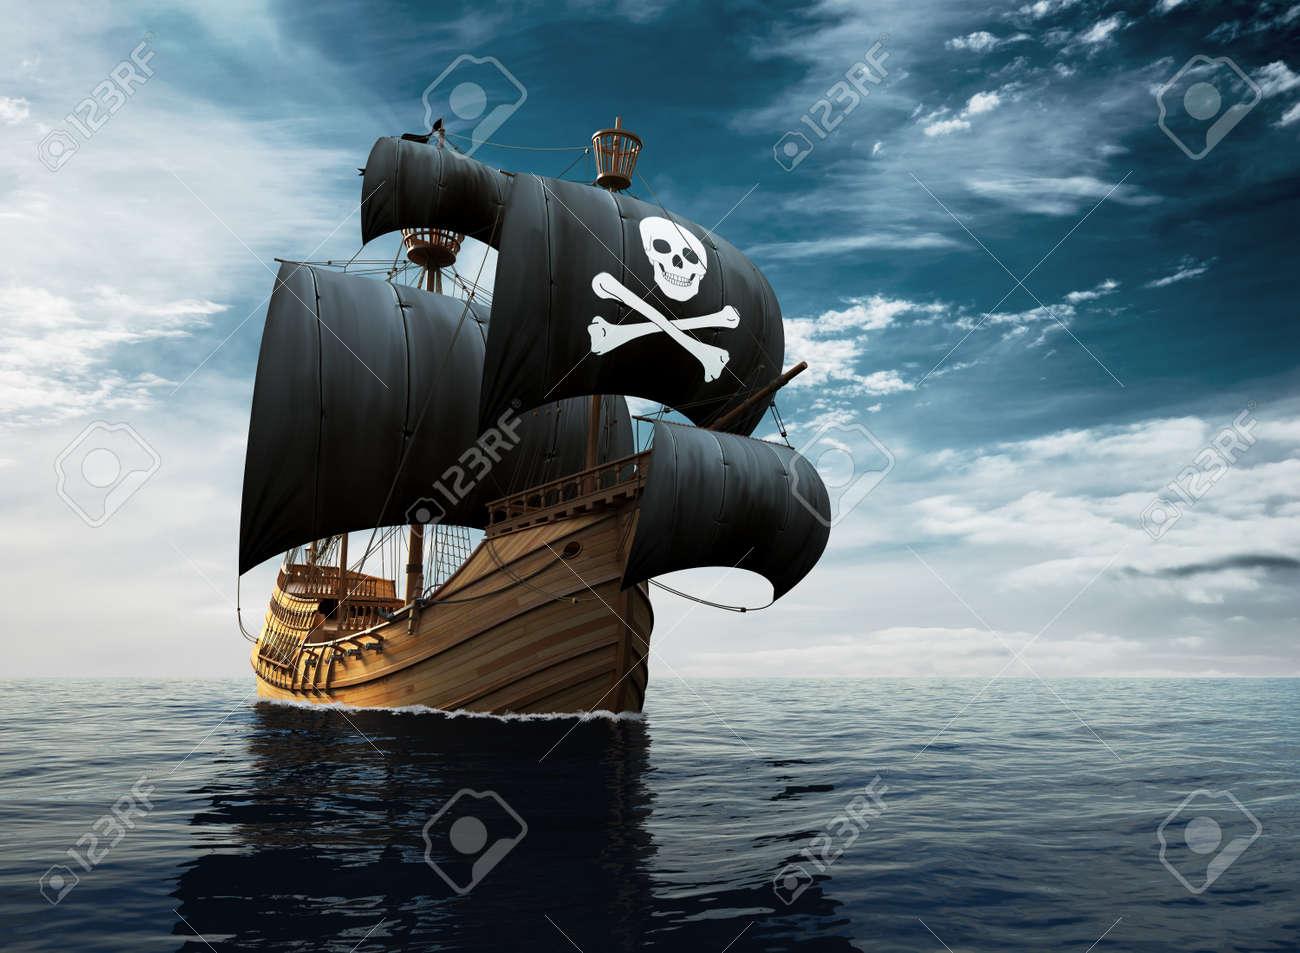 Pirate Ship On The High Seas - 80986650